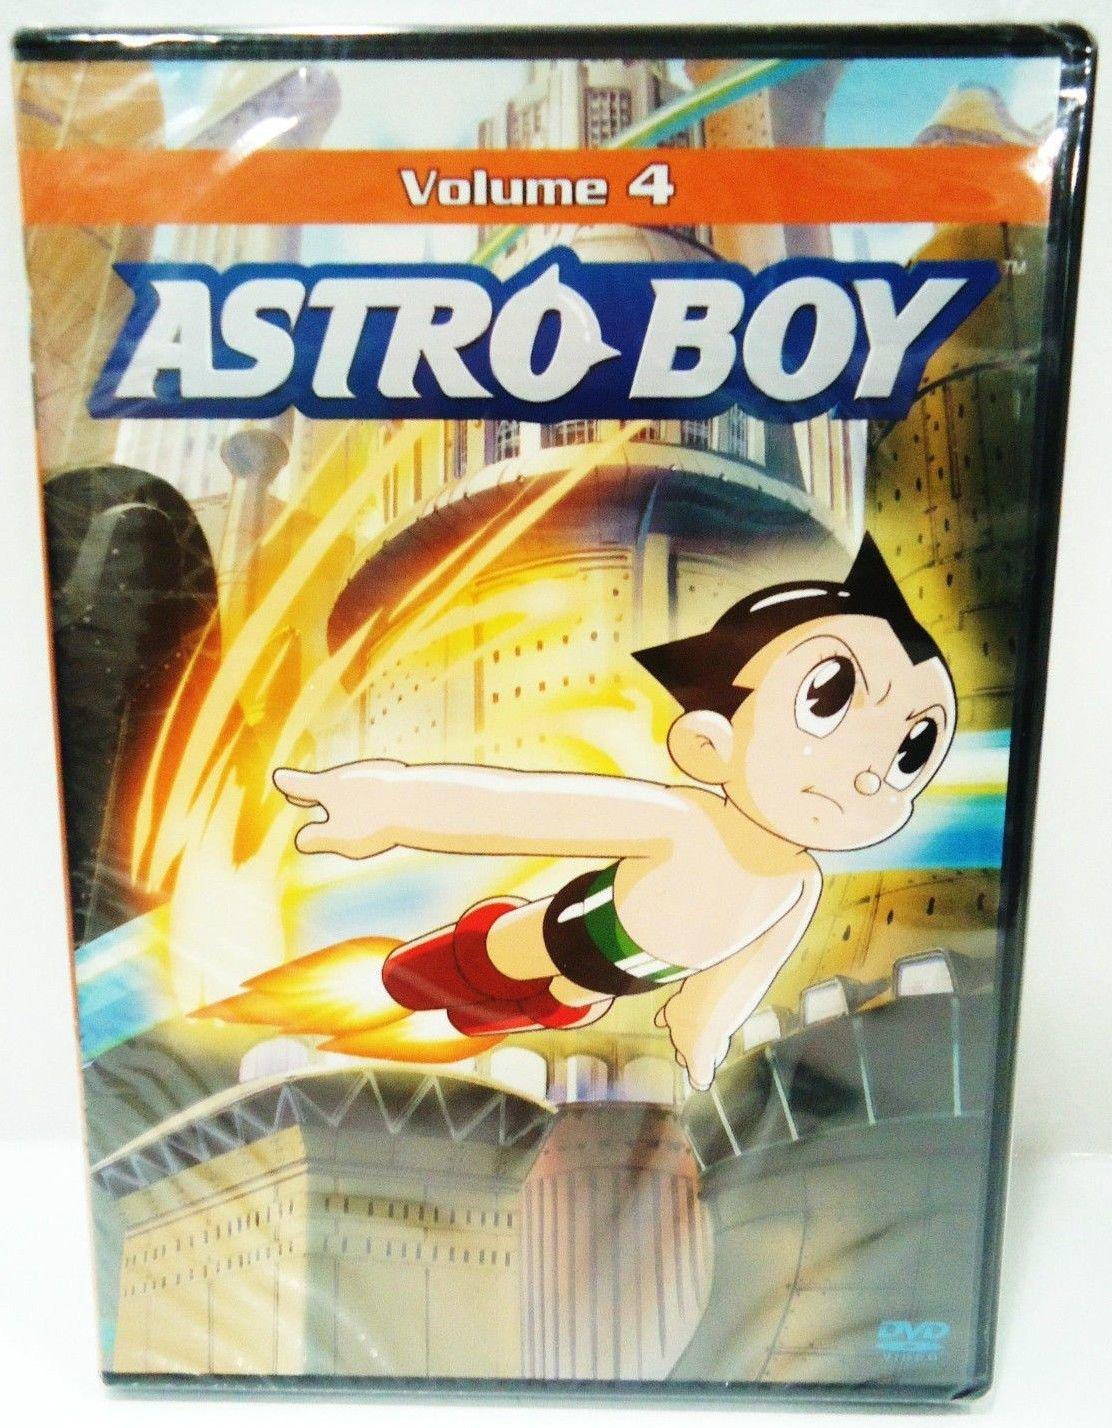 ASTRO BOY - VOLUME 4 - DVD - VINTAGE - COMIC - CARTOON - NEW - JAPANESE - ANIME